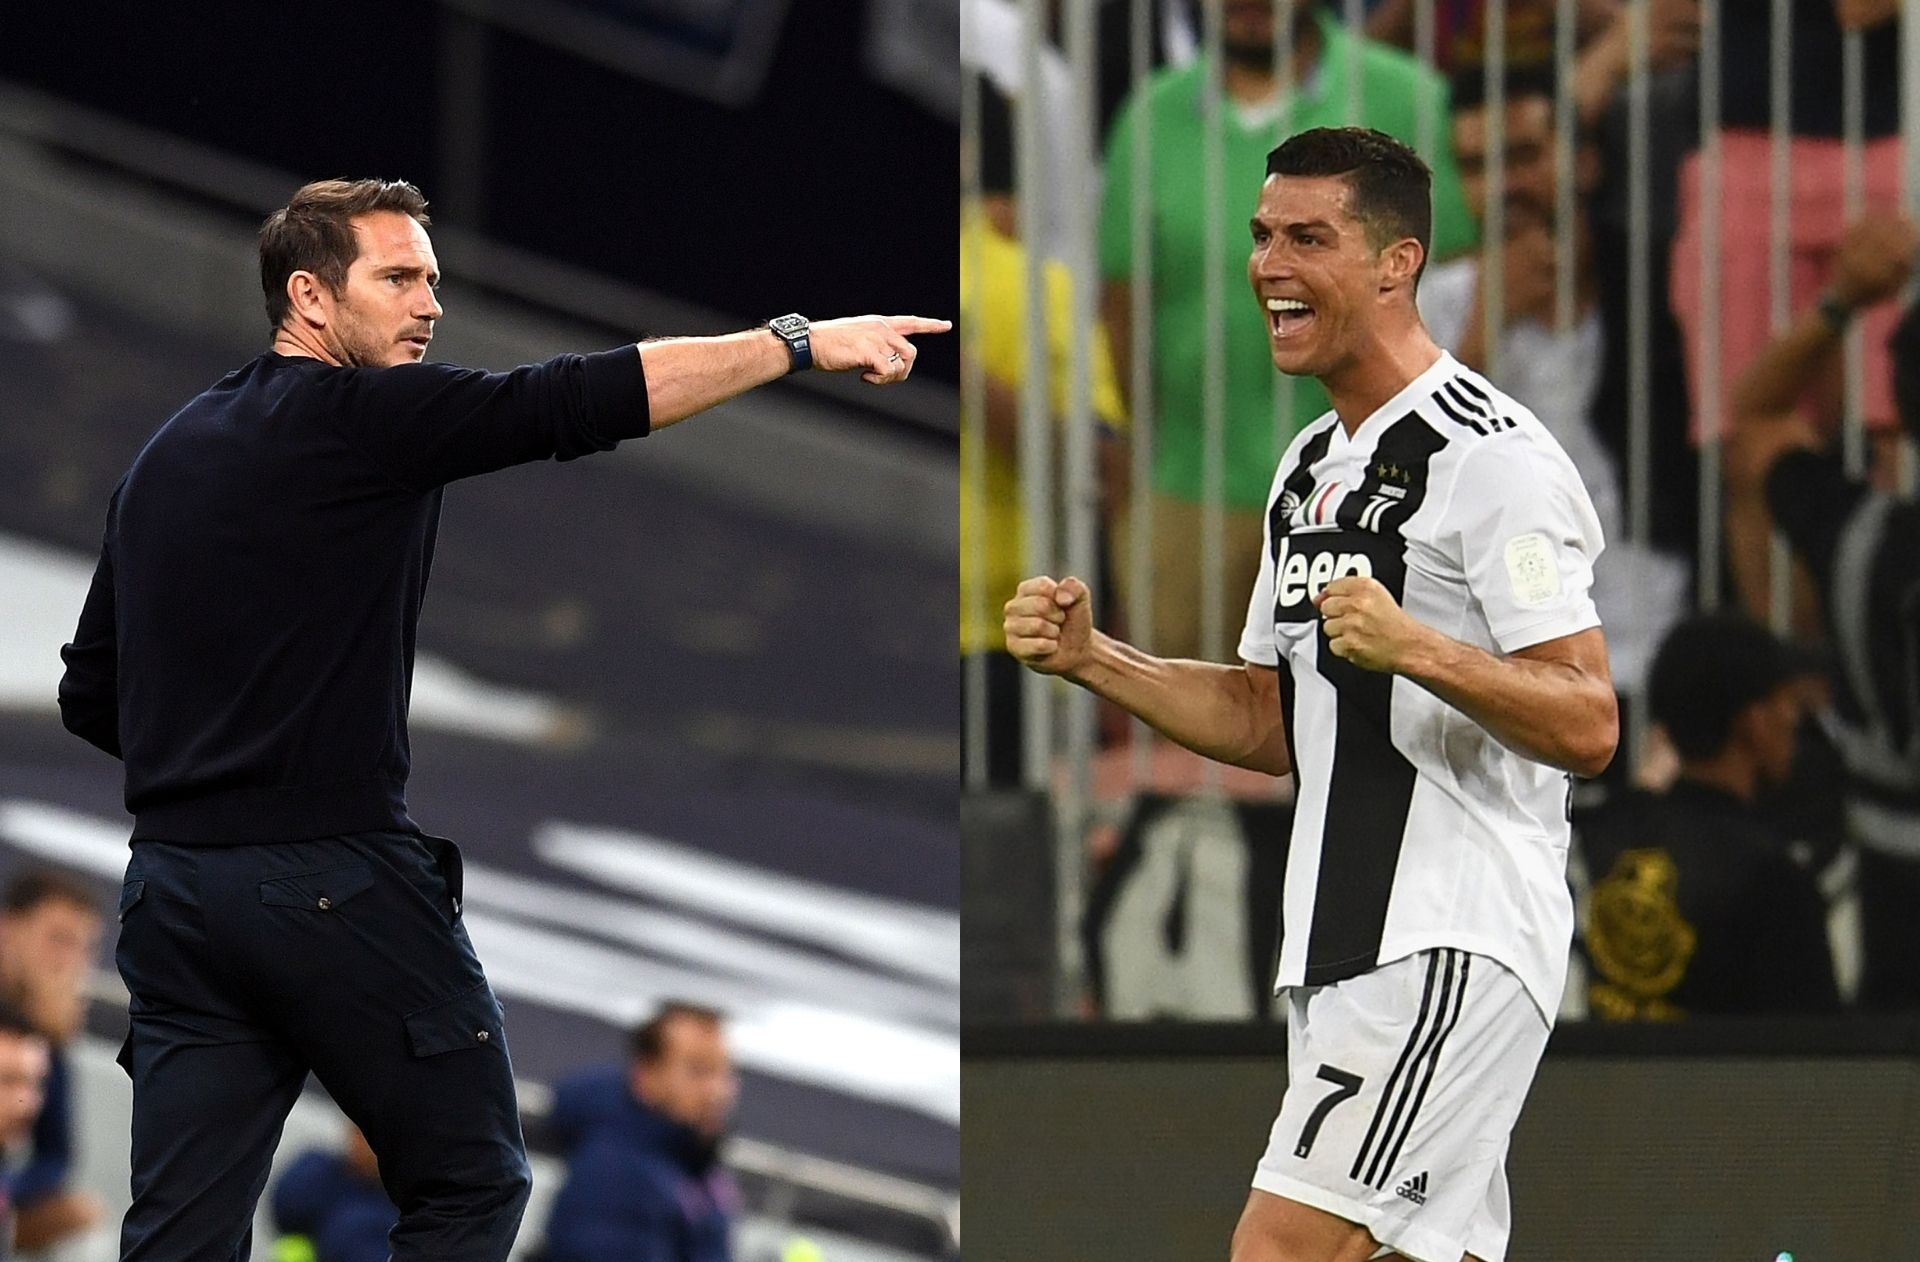 Frank Lampard of Chelsea, Cristiano Ronaldo of Juventus